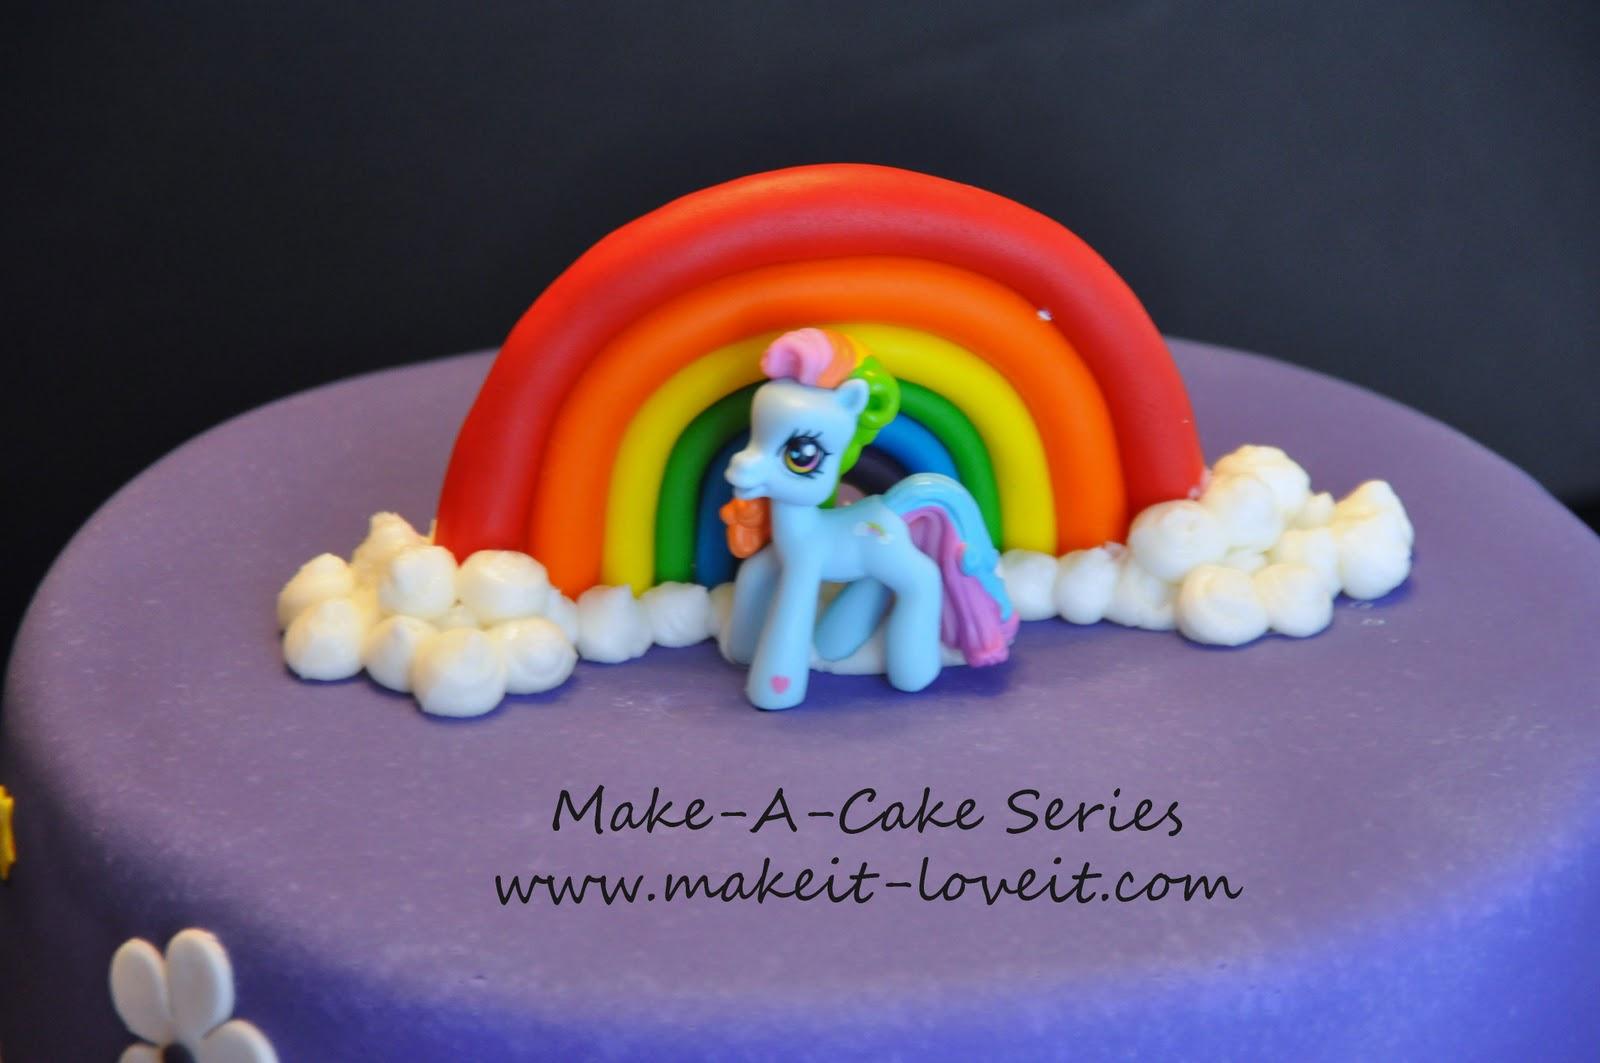 Groovy Make A Cake Series My Little Pony Cake And Rainbow Cookies Funny Birthday Cards Online Kookostrdamsfinfo